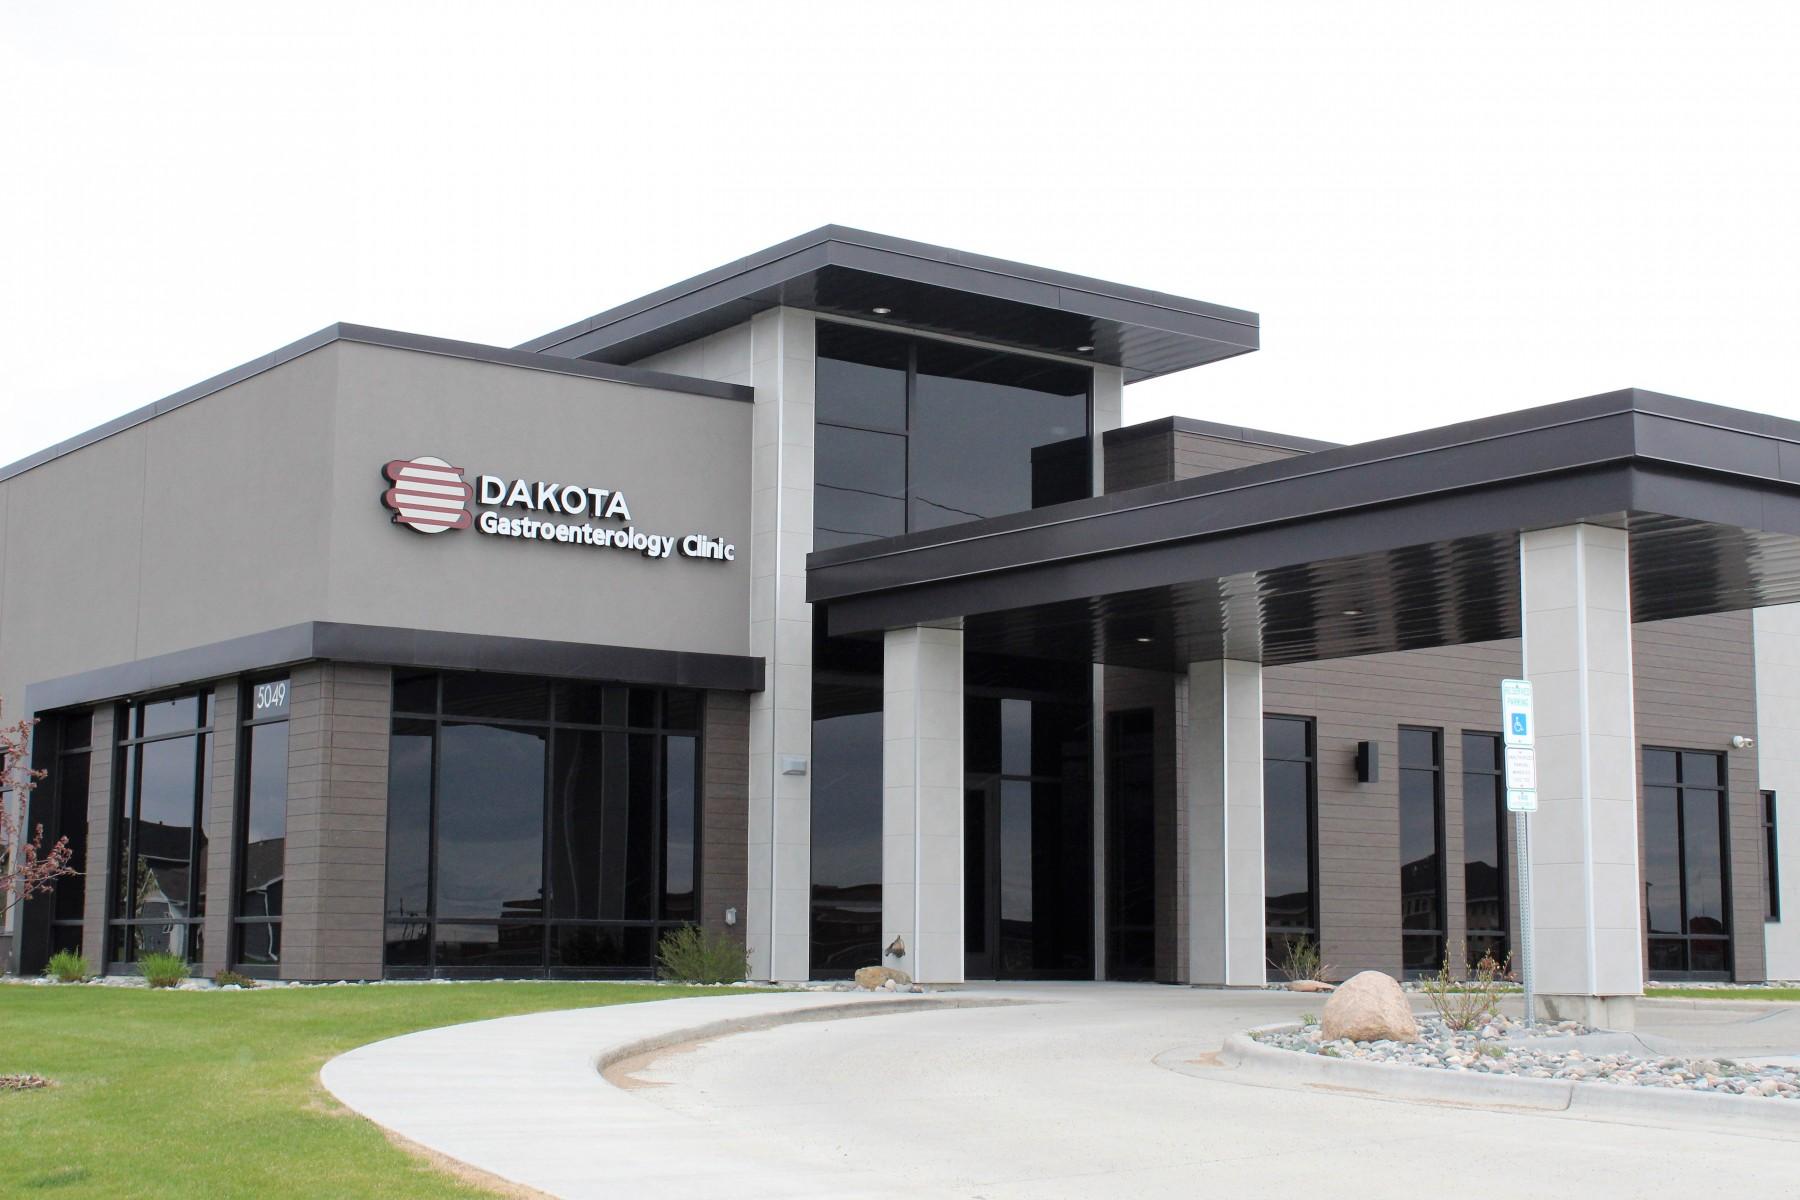 Modern design with exterior stone and brick by OTXteriors on Dakota Gasteroenterology Clinic in Fargo North Dakota